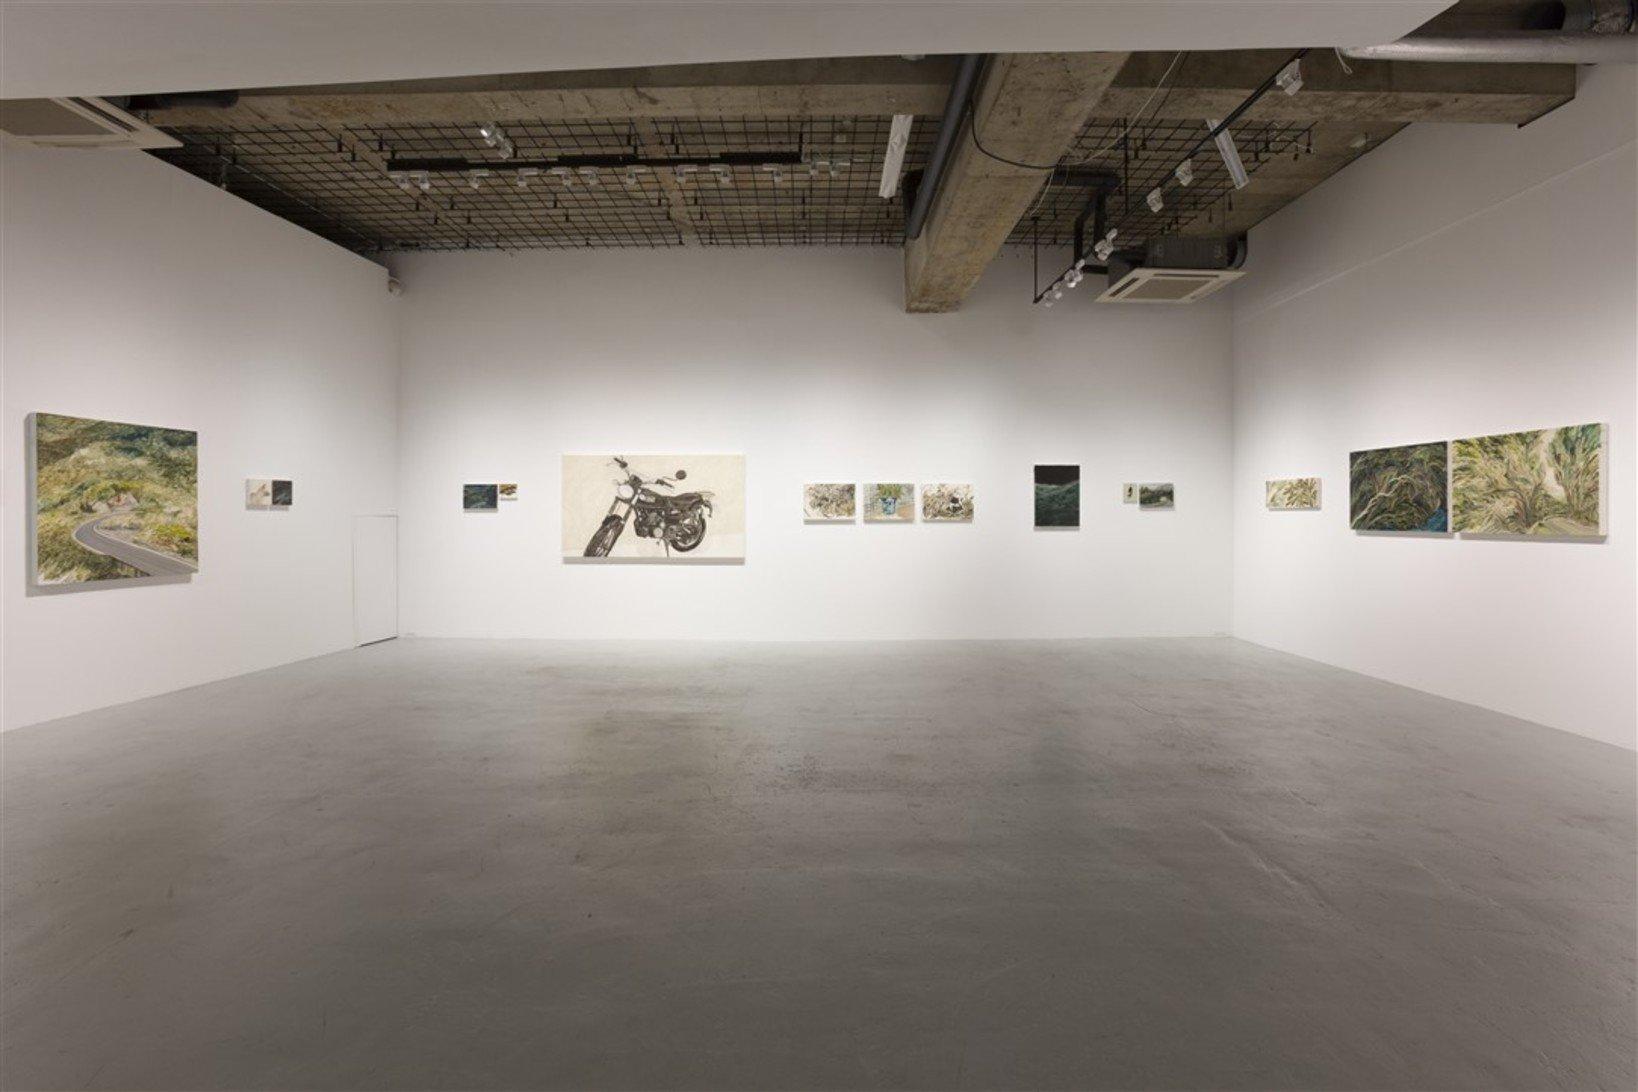 Installation view at nca   nichido contemporary art / photo by Kei Okano